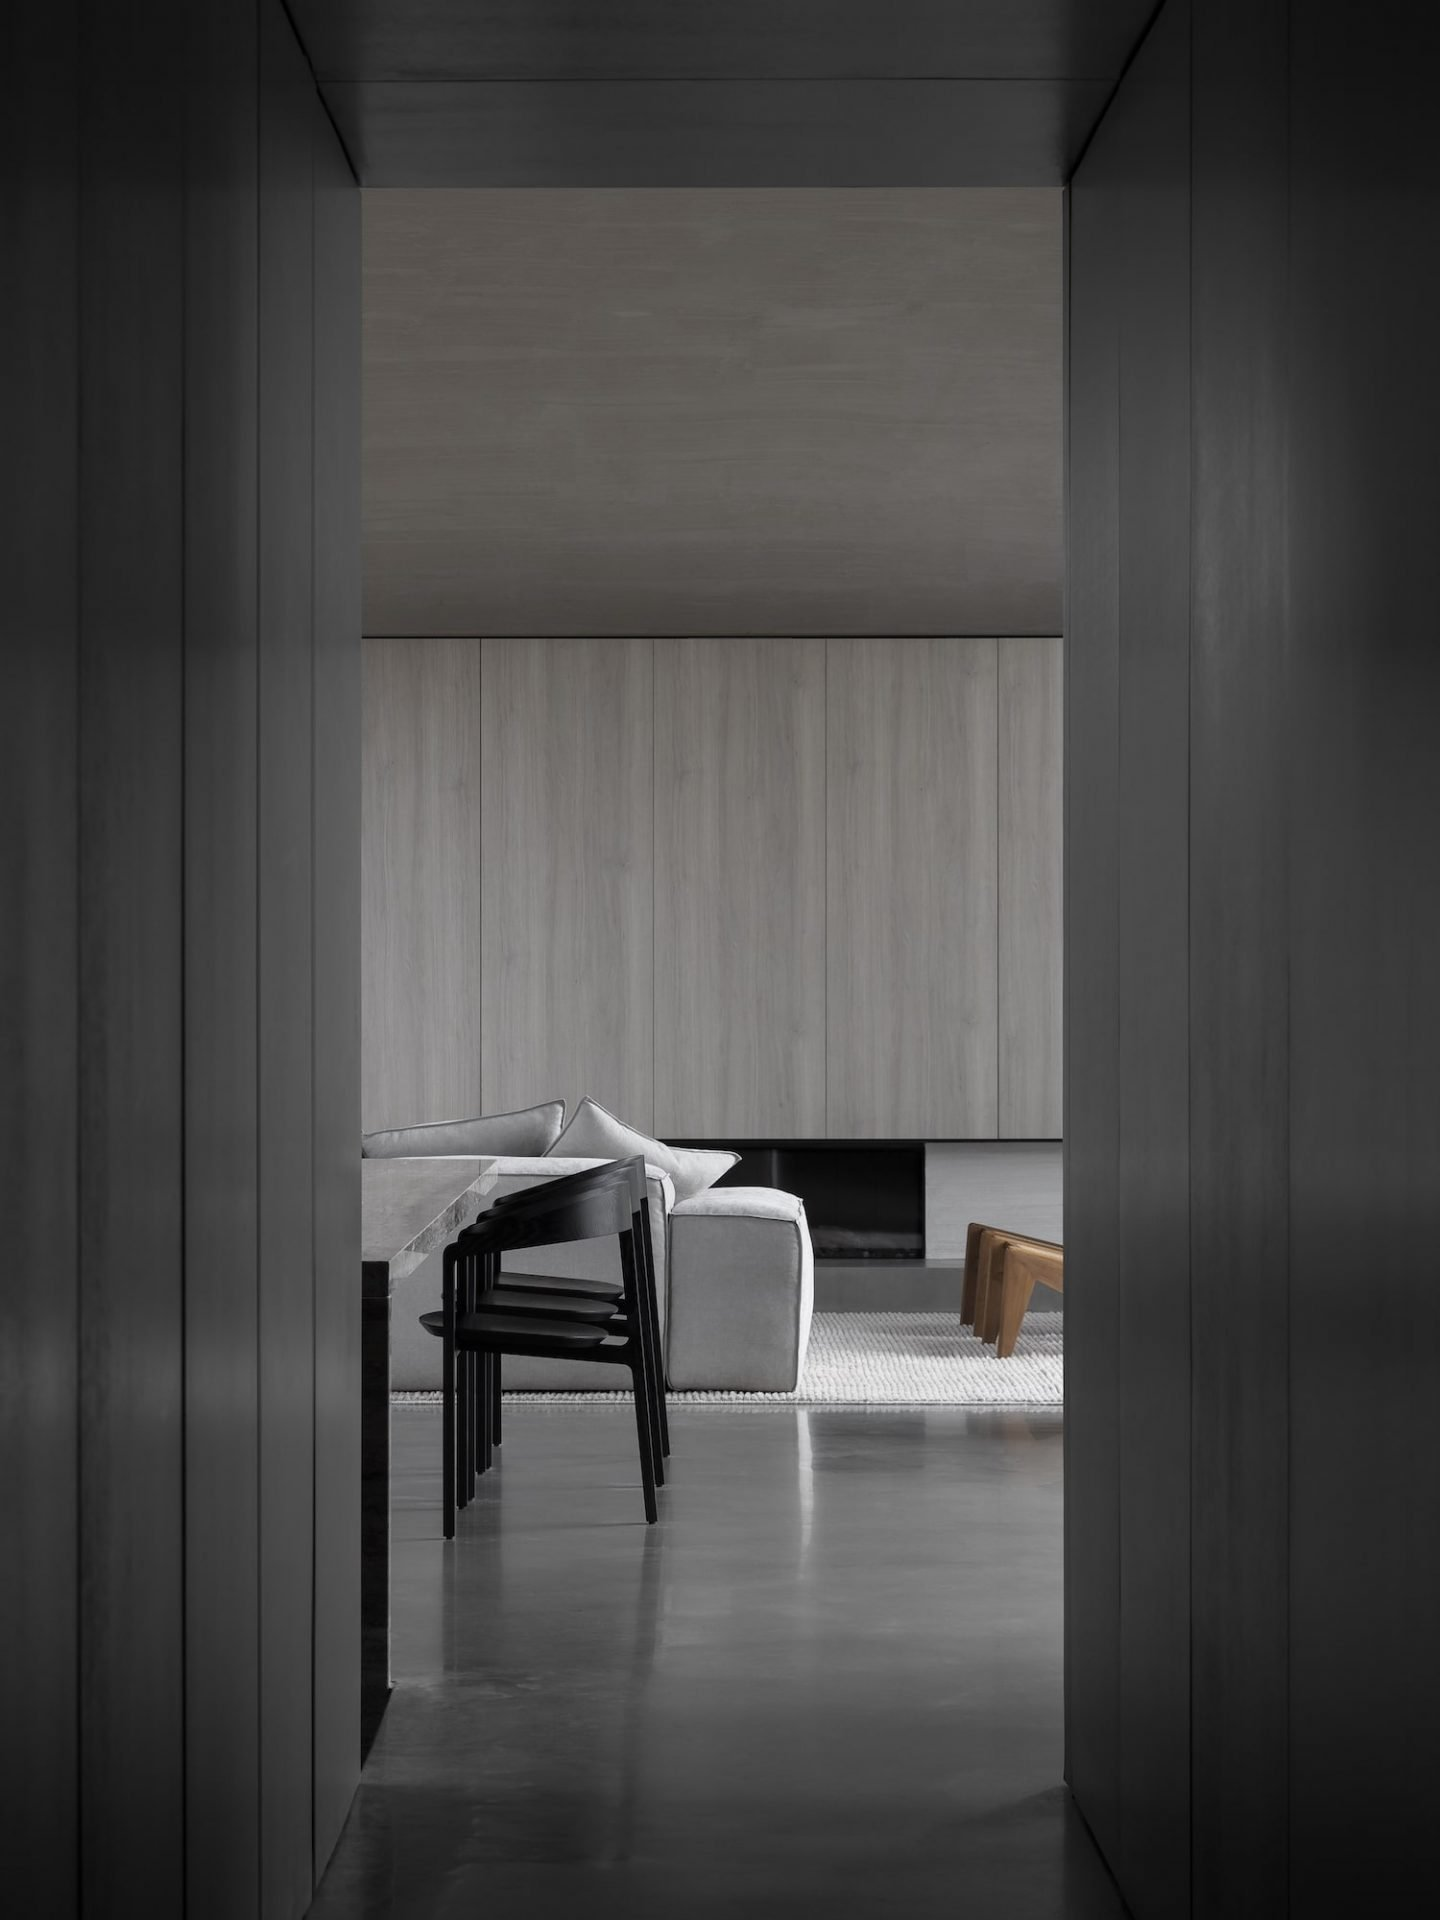 IGNANT-Architecture-Adam-Kane-Barwon-Heads-012-min